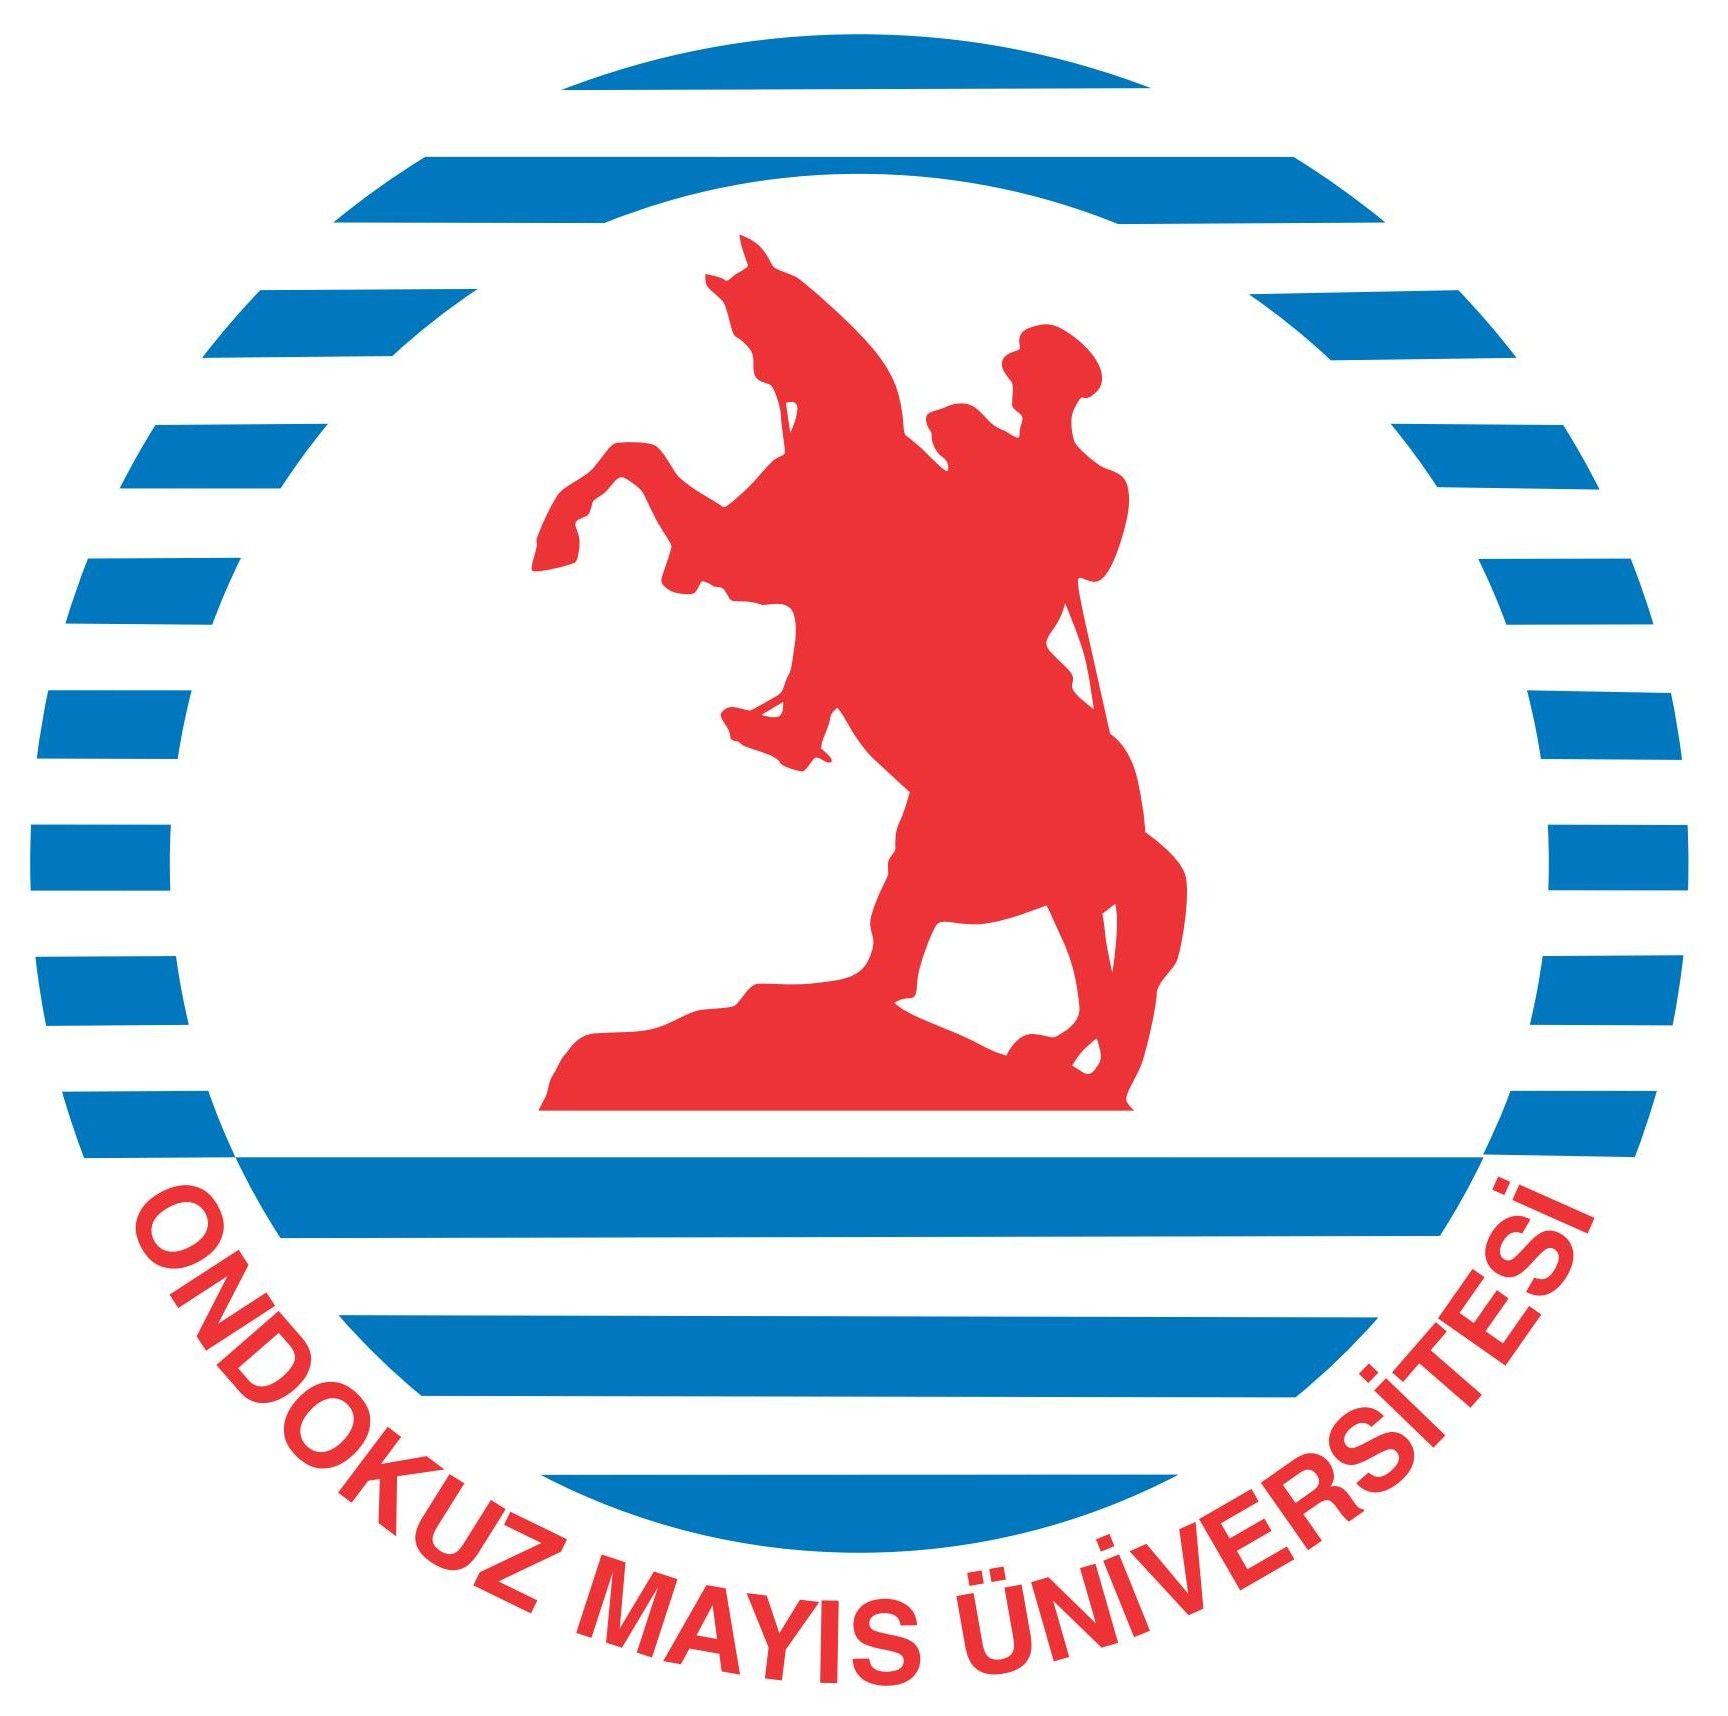 Omu Ondokuz Mayis Universitesi Samsun Vektorel Logosu Eps Pdf Ondokuz Mayis University Logos Poster Template University Logo